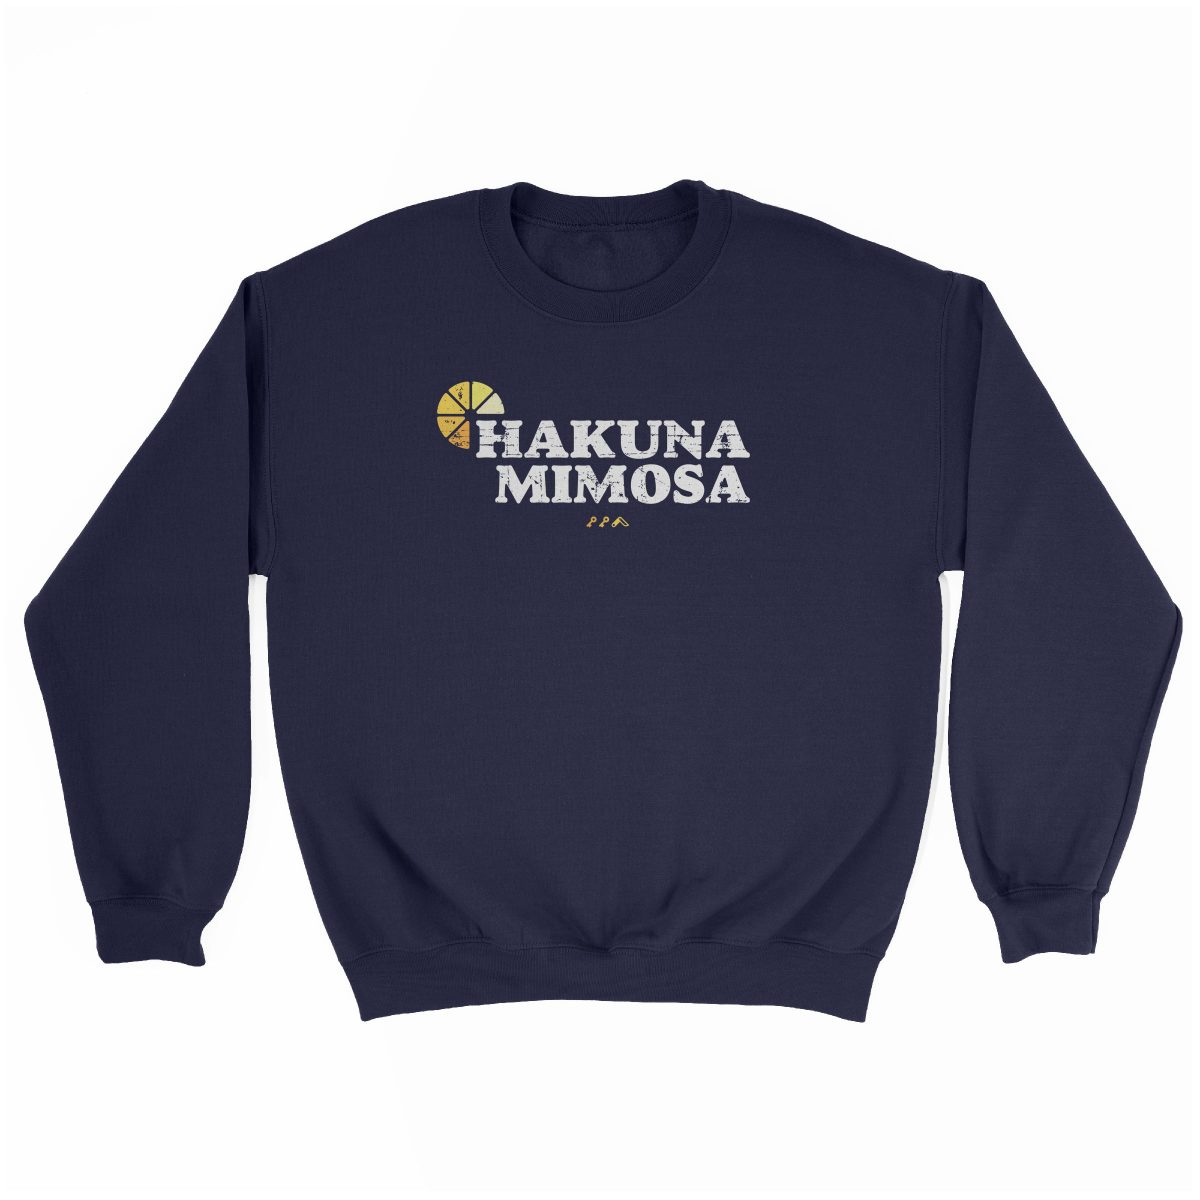 HAKUNA MIMOSA funny sunday funday brunch sweatshirt in navy at kikicutt.com